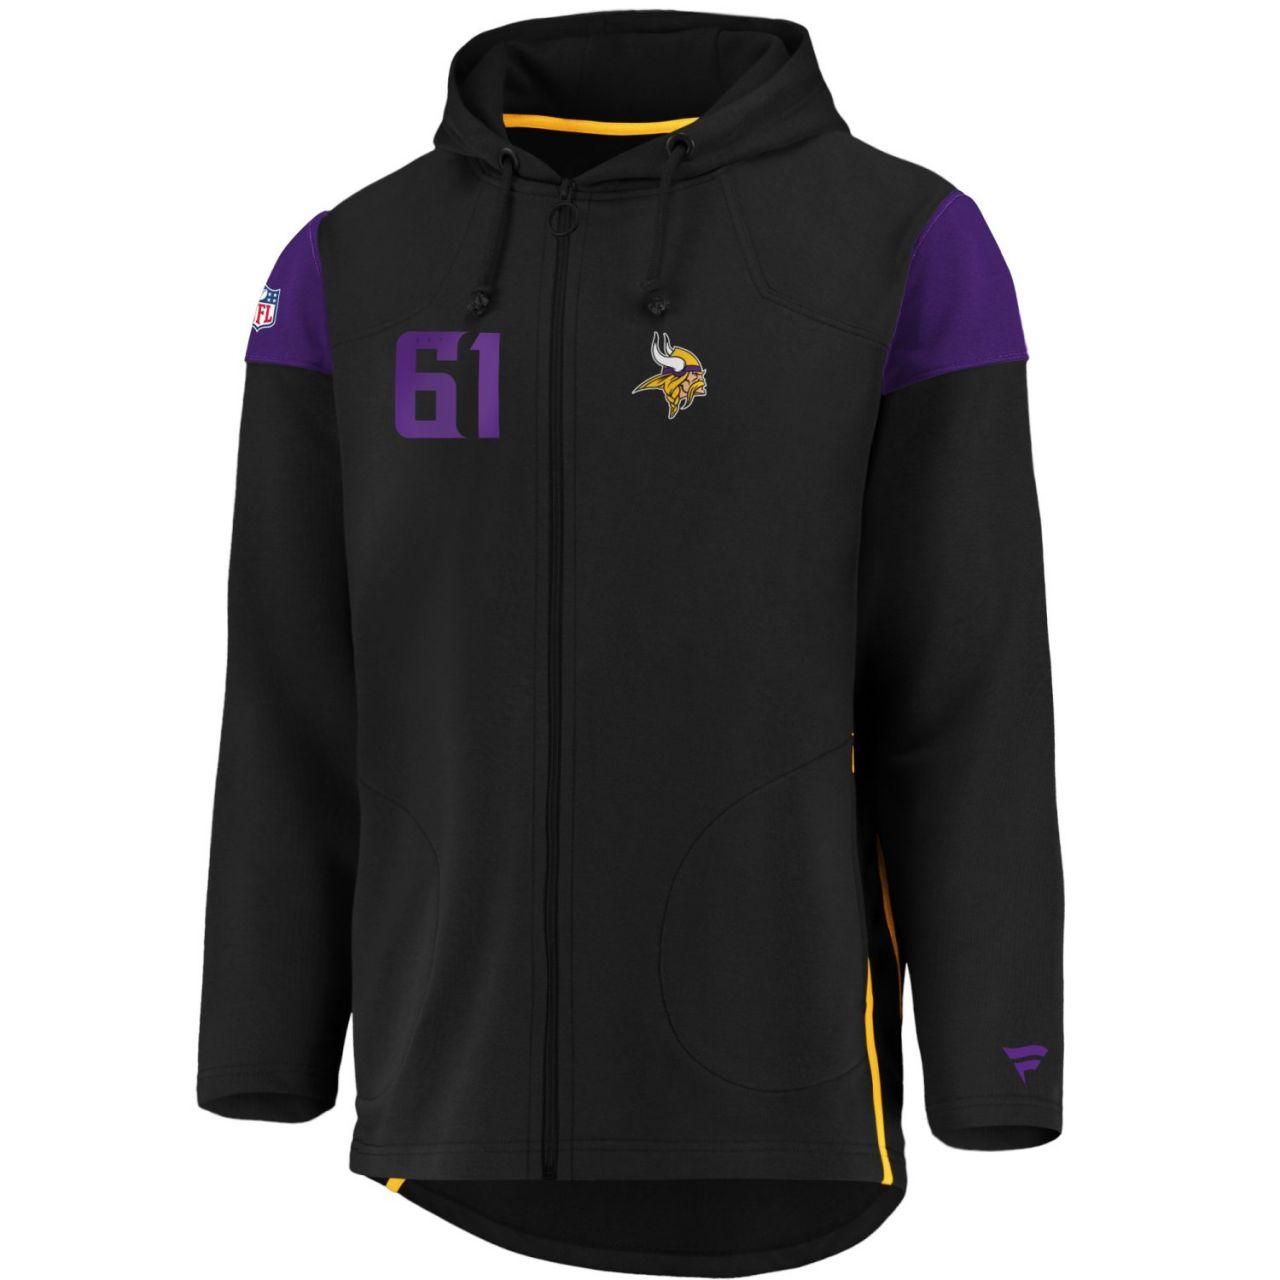 amfoo - Iconic Franchise Full Zip NFL Hoodie - Minnesota Vikings